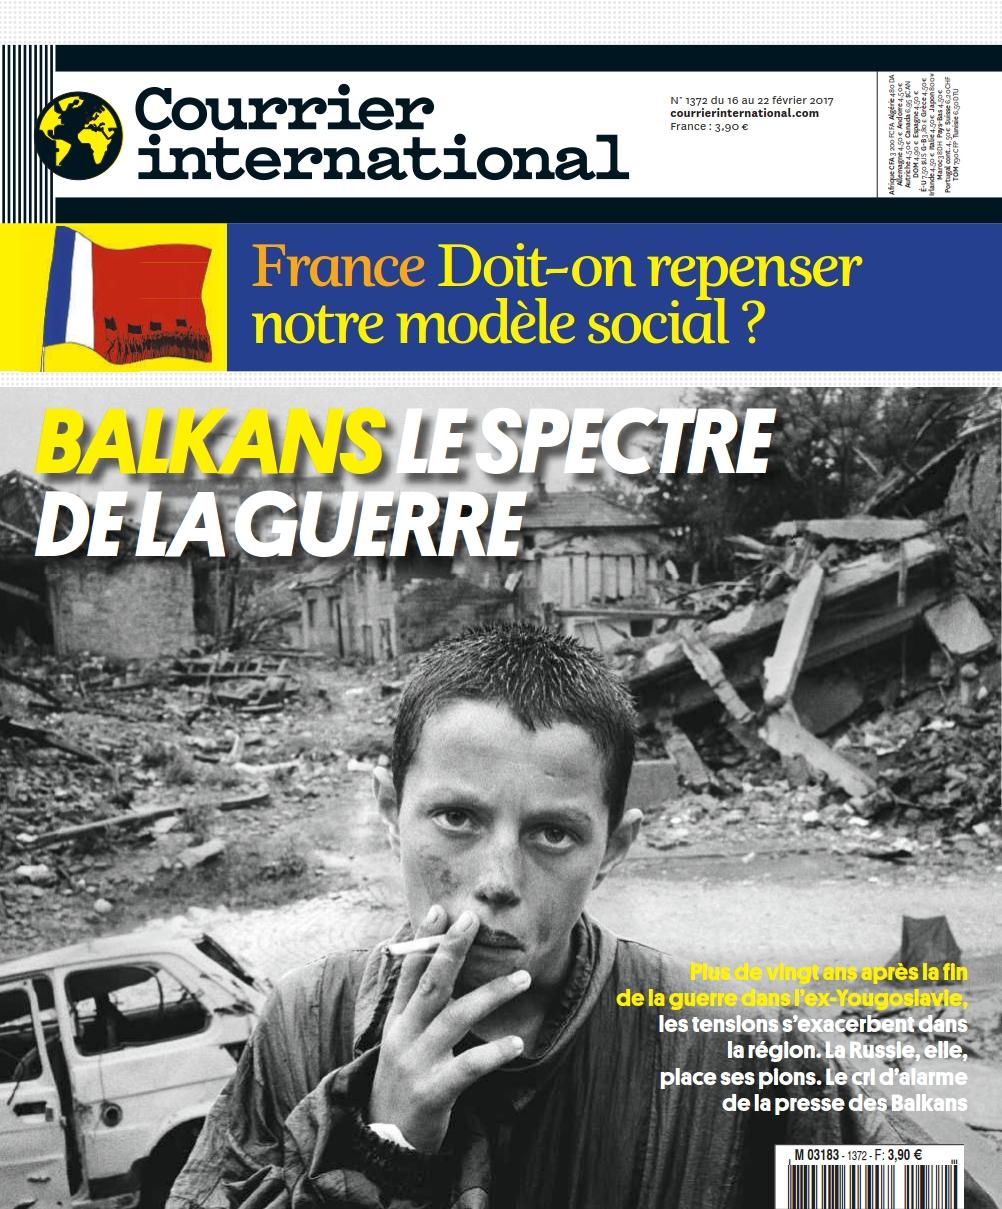 Courrier international N°1372 - 16 au 22 Février 2017